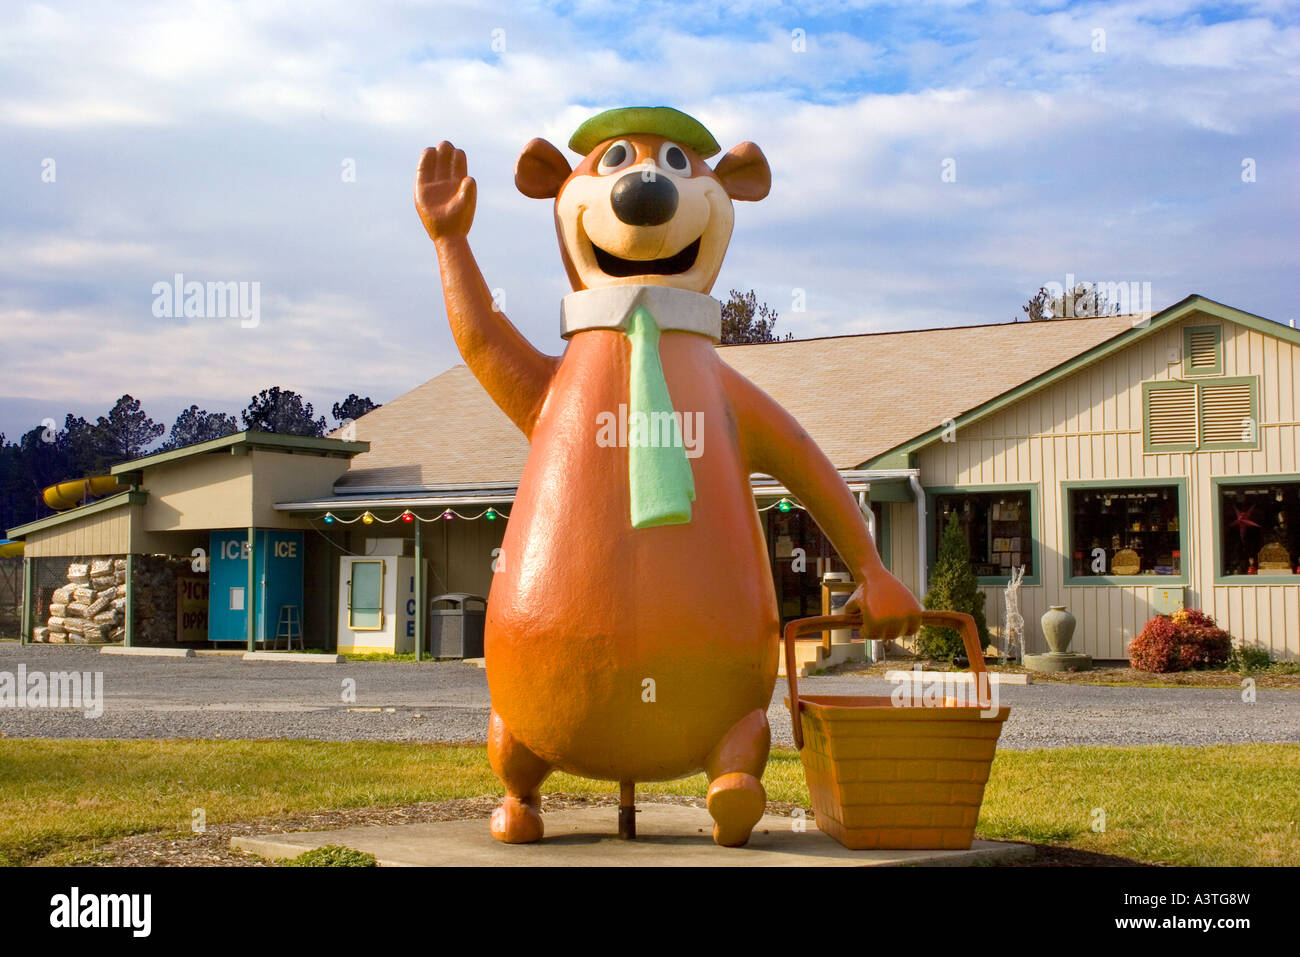 Yogi Bear Statue At A Jellystone Park Campground In Luray Virginia Stock Photo Alamy